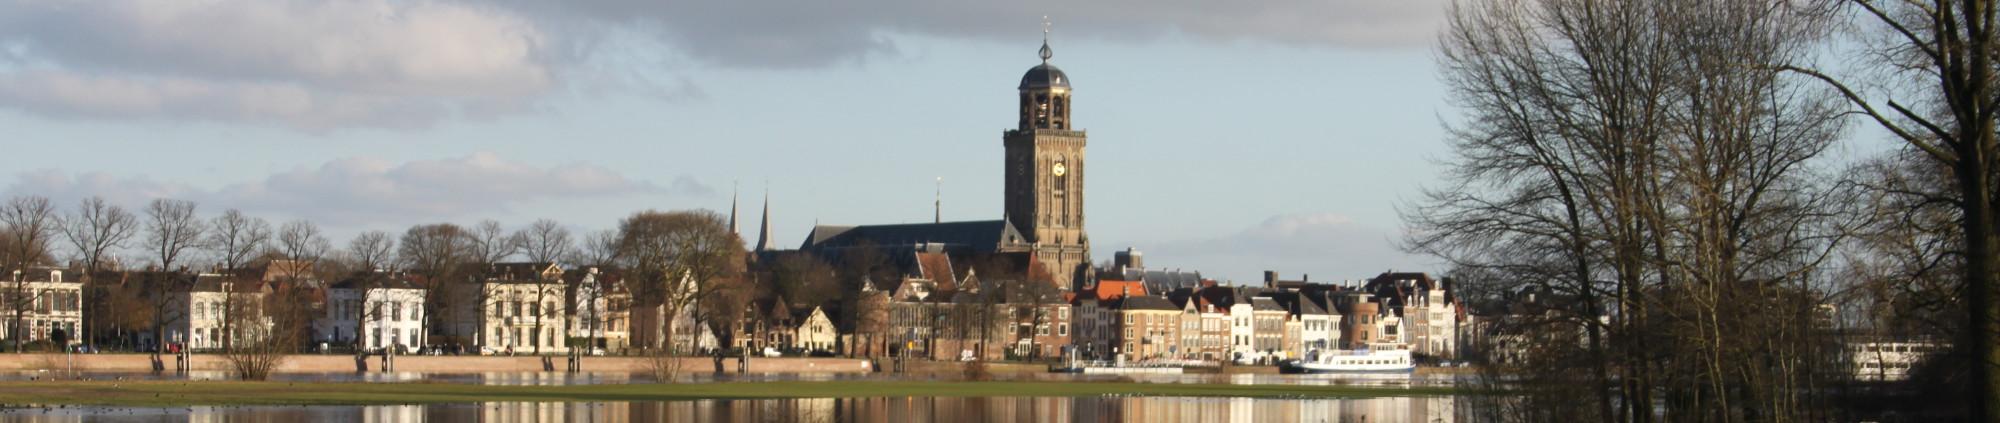 Kerk in Deventer